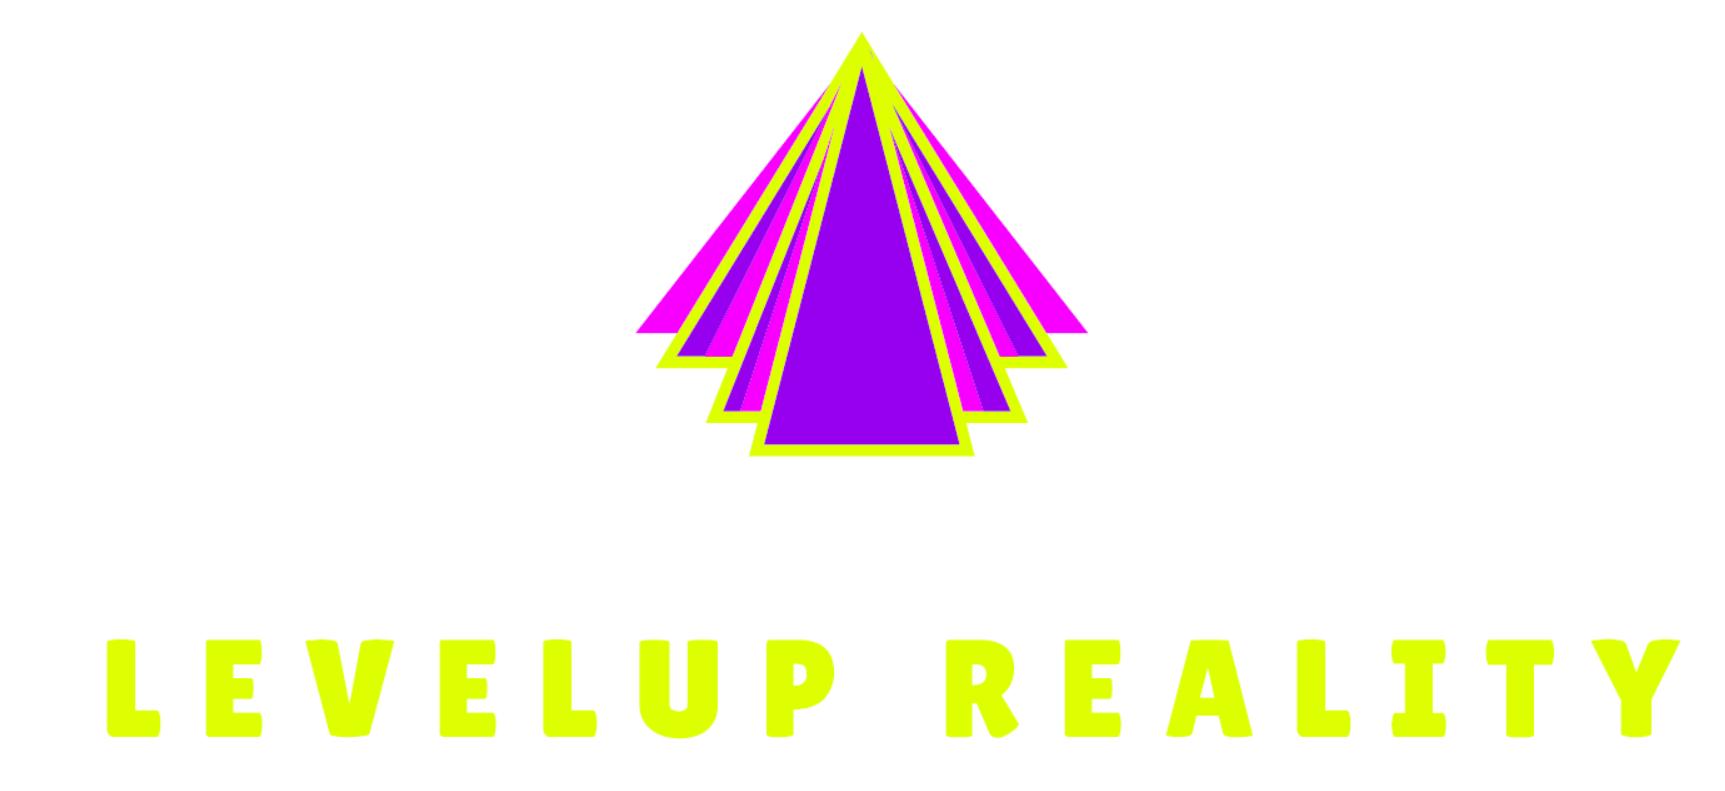 Levelup Reality Logo Transparent Logos Gaming Logos Reality